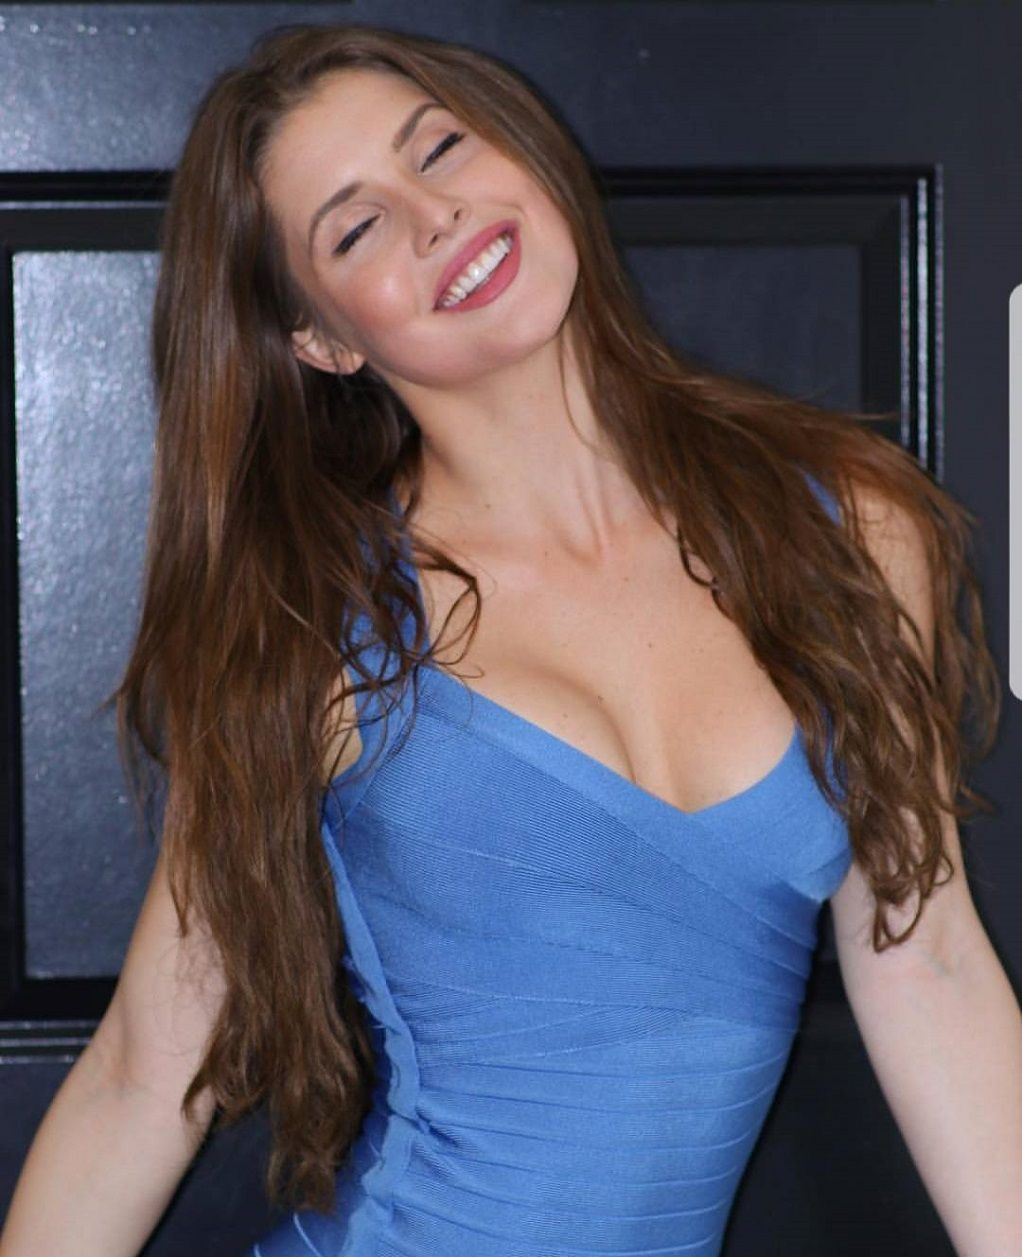 Amanda cerny plastic surgery